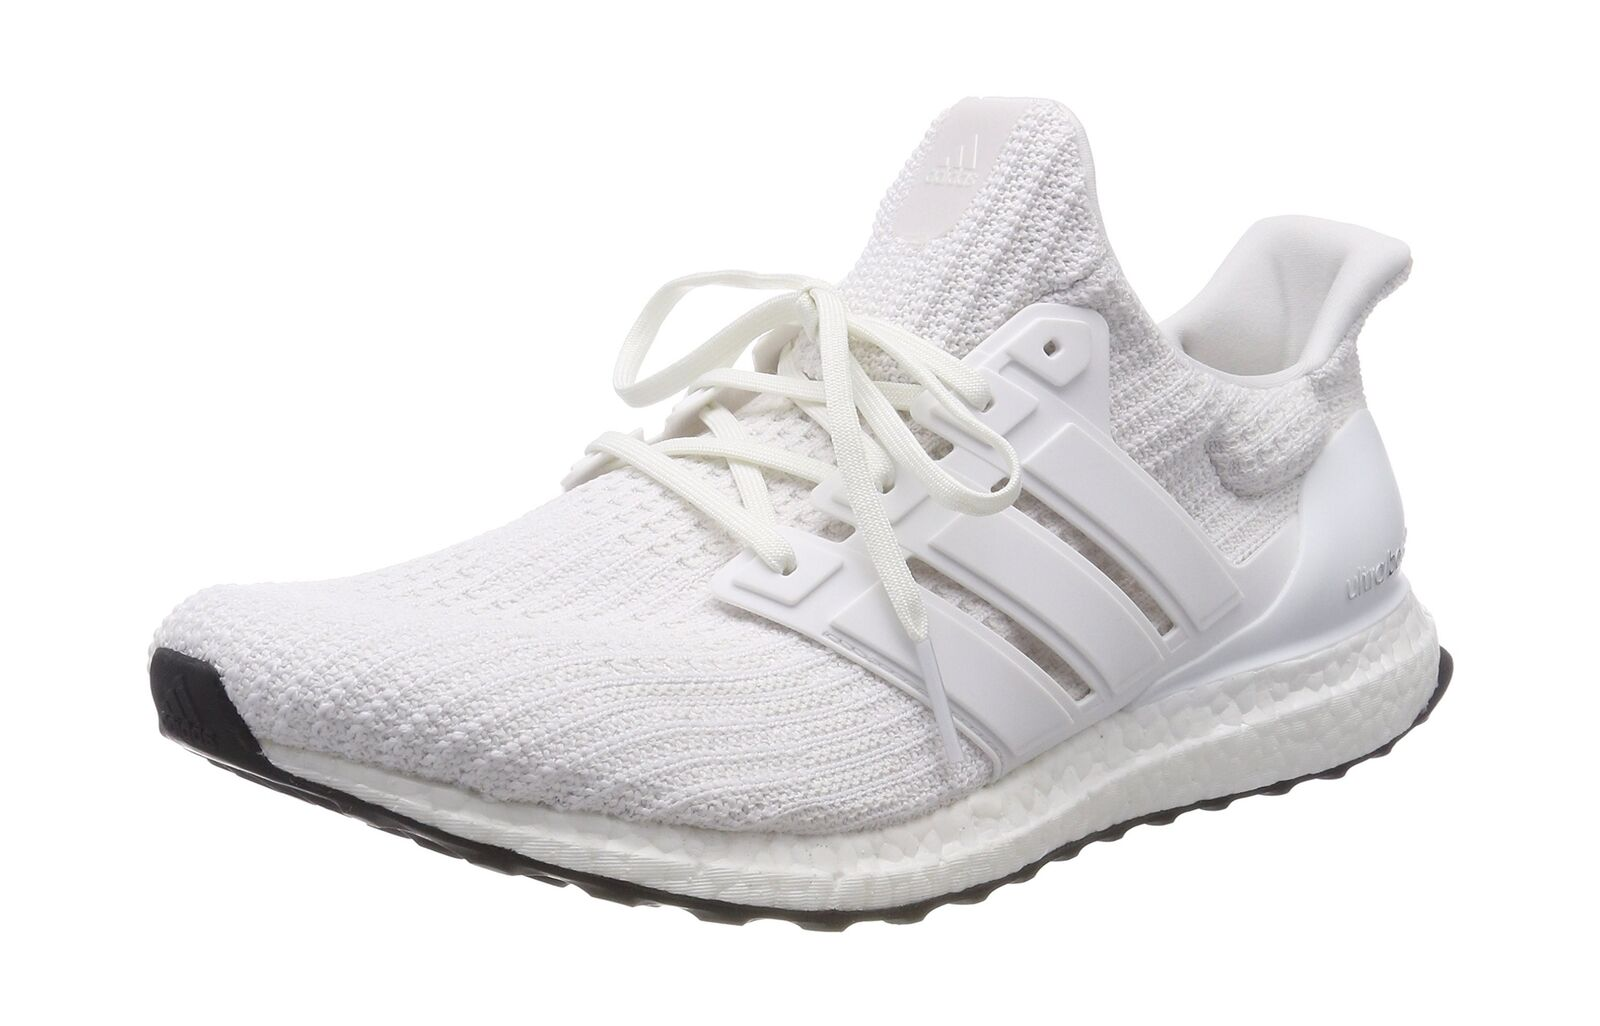 hot sale online f0869 79095 Adidas da uomini ultraboost scarpe da Adidas corsa 9,5 uk